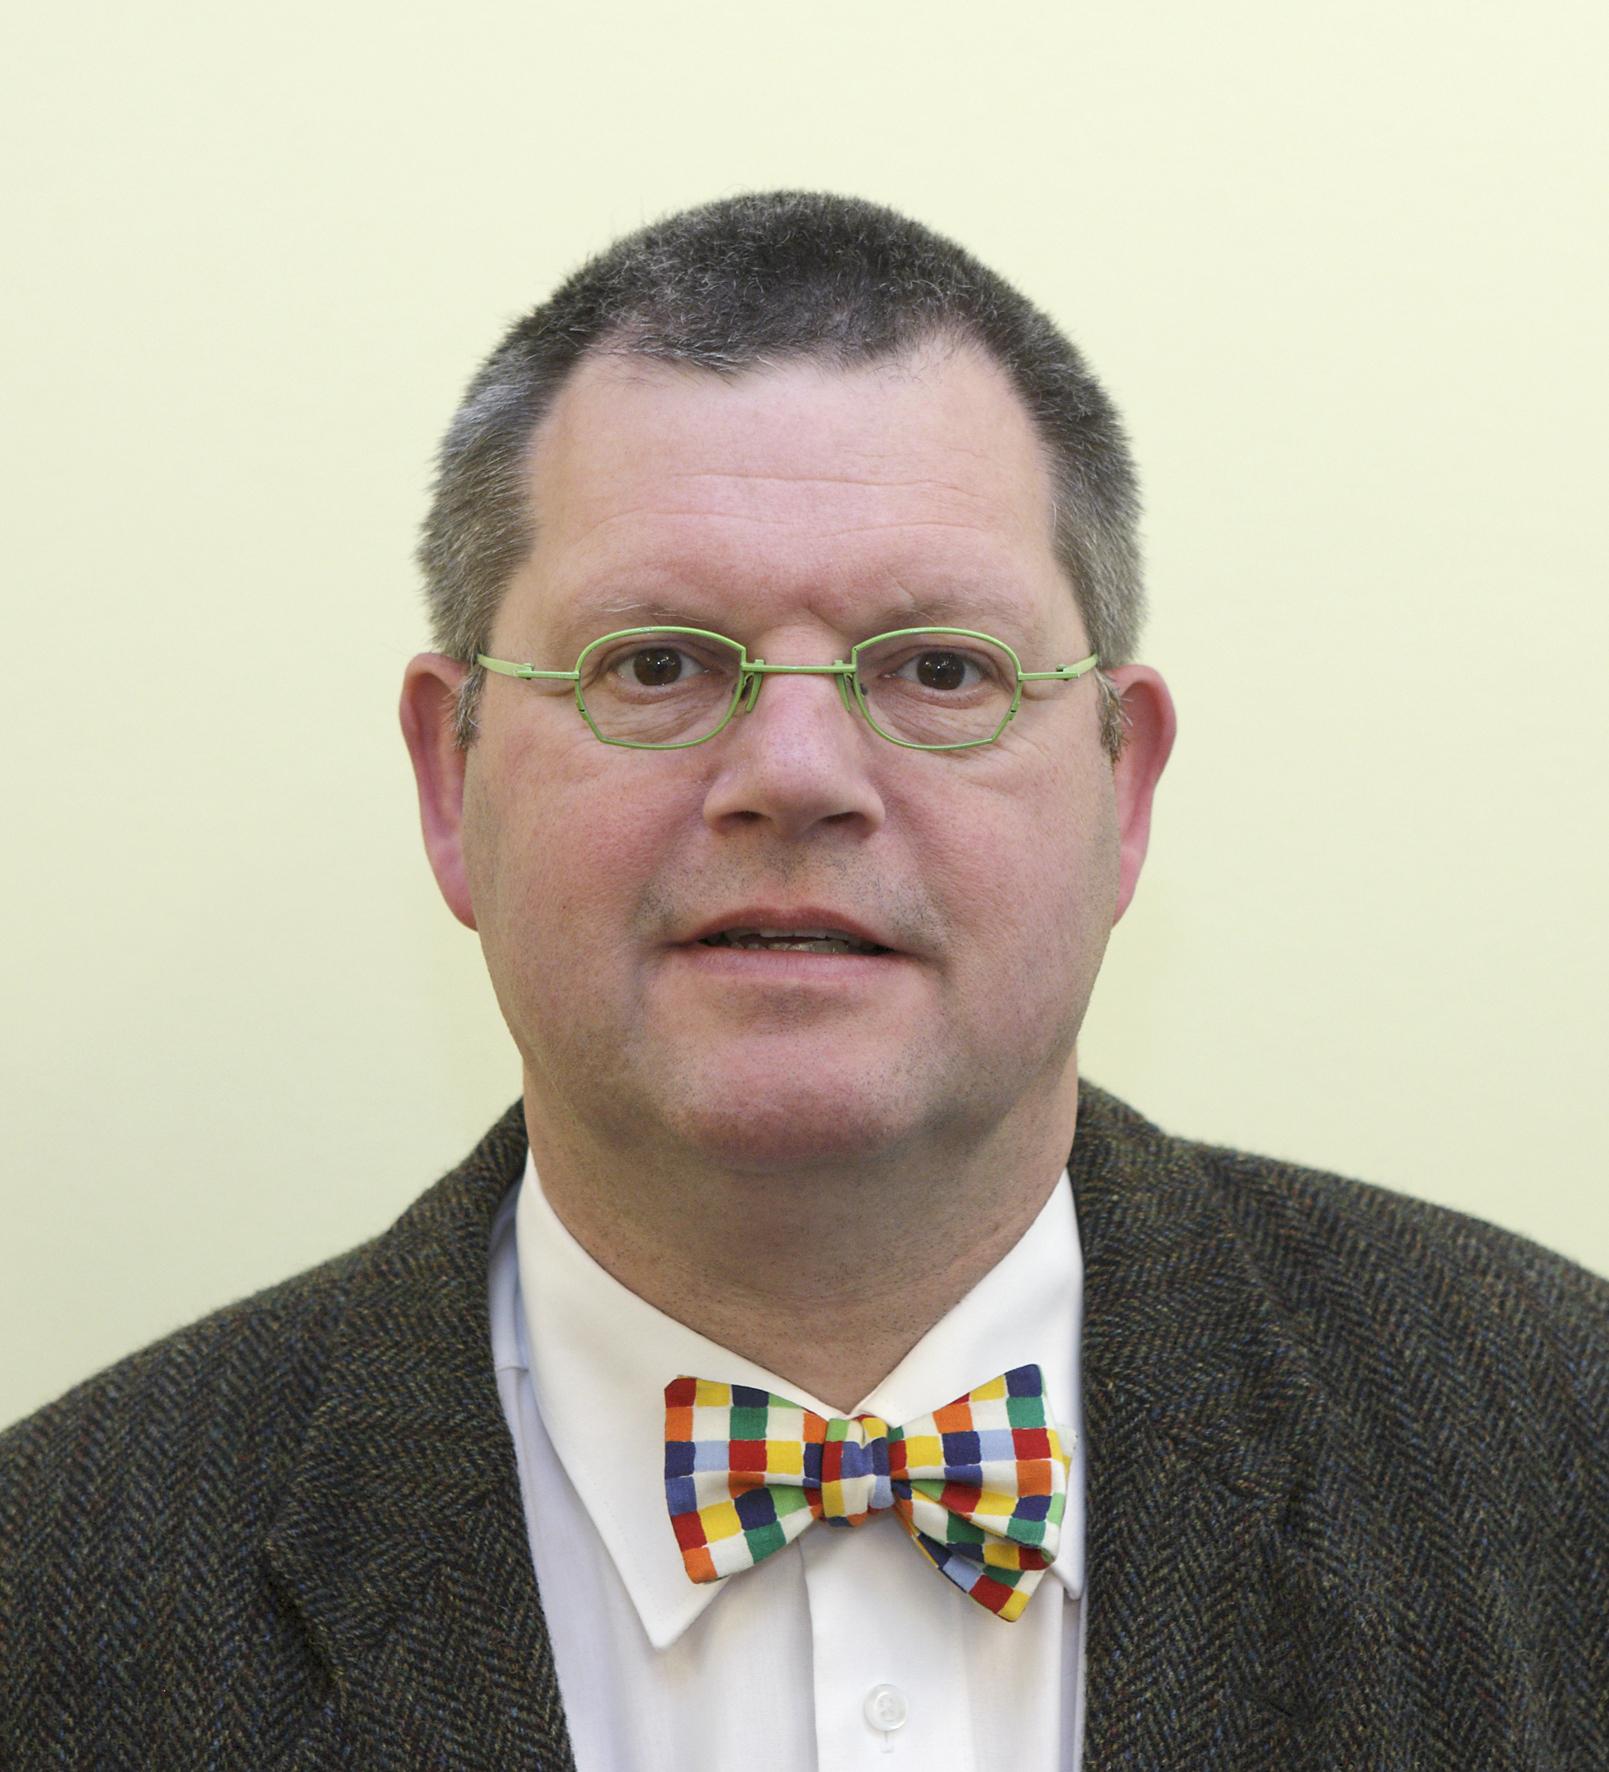 Photo of Dr. Egge Knol